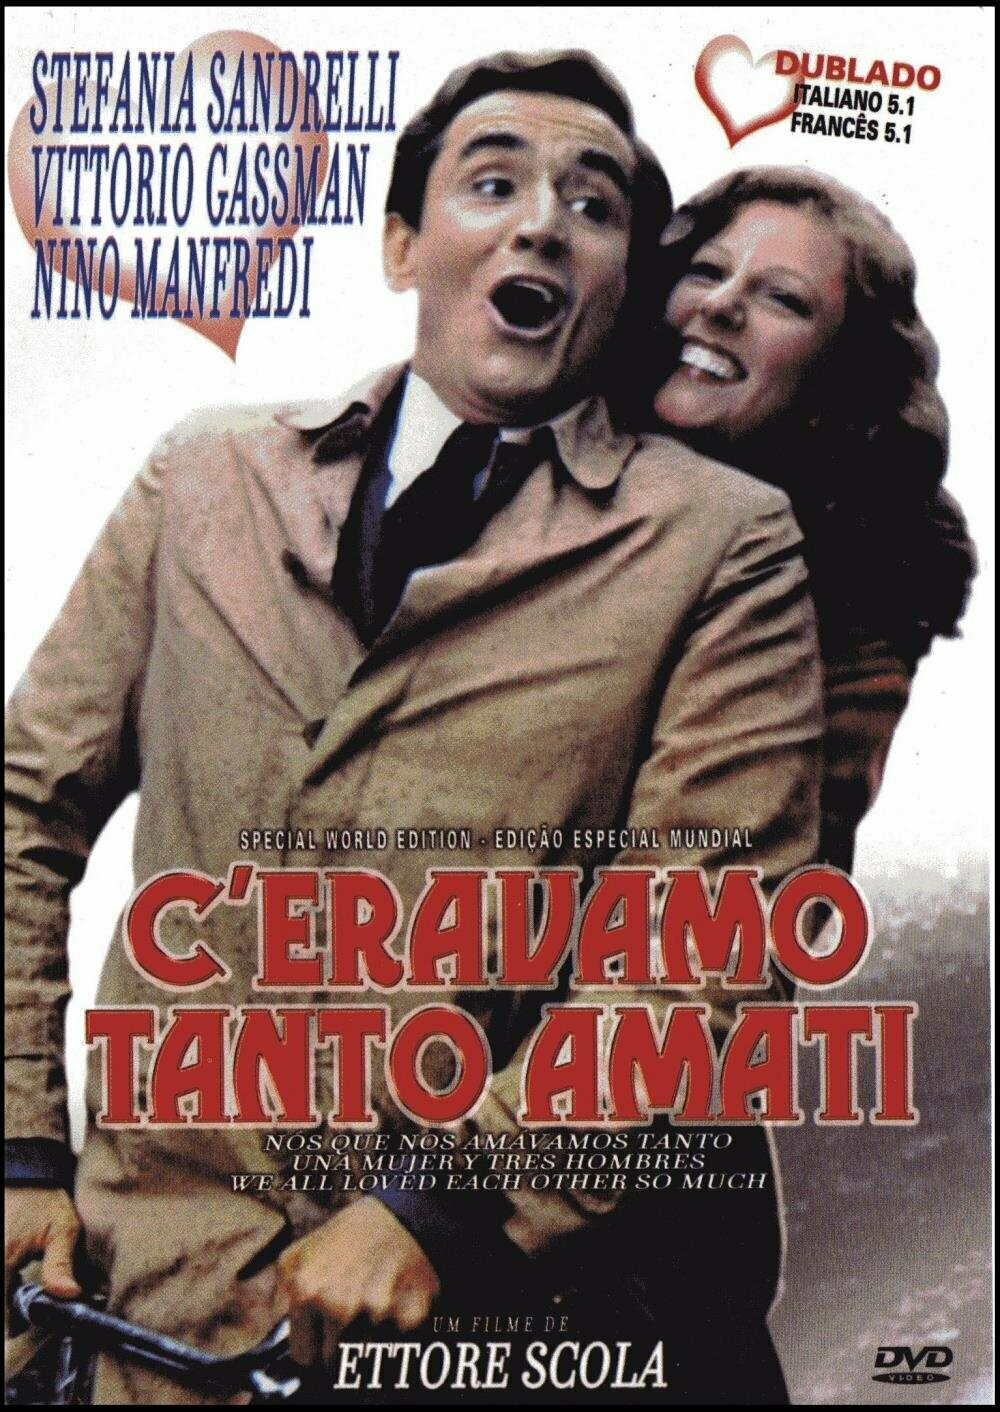 NOS QUE NOS AMAVAMOS TANTO - DVD